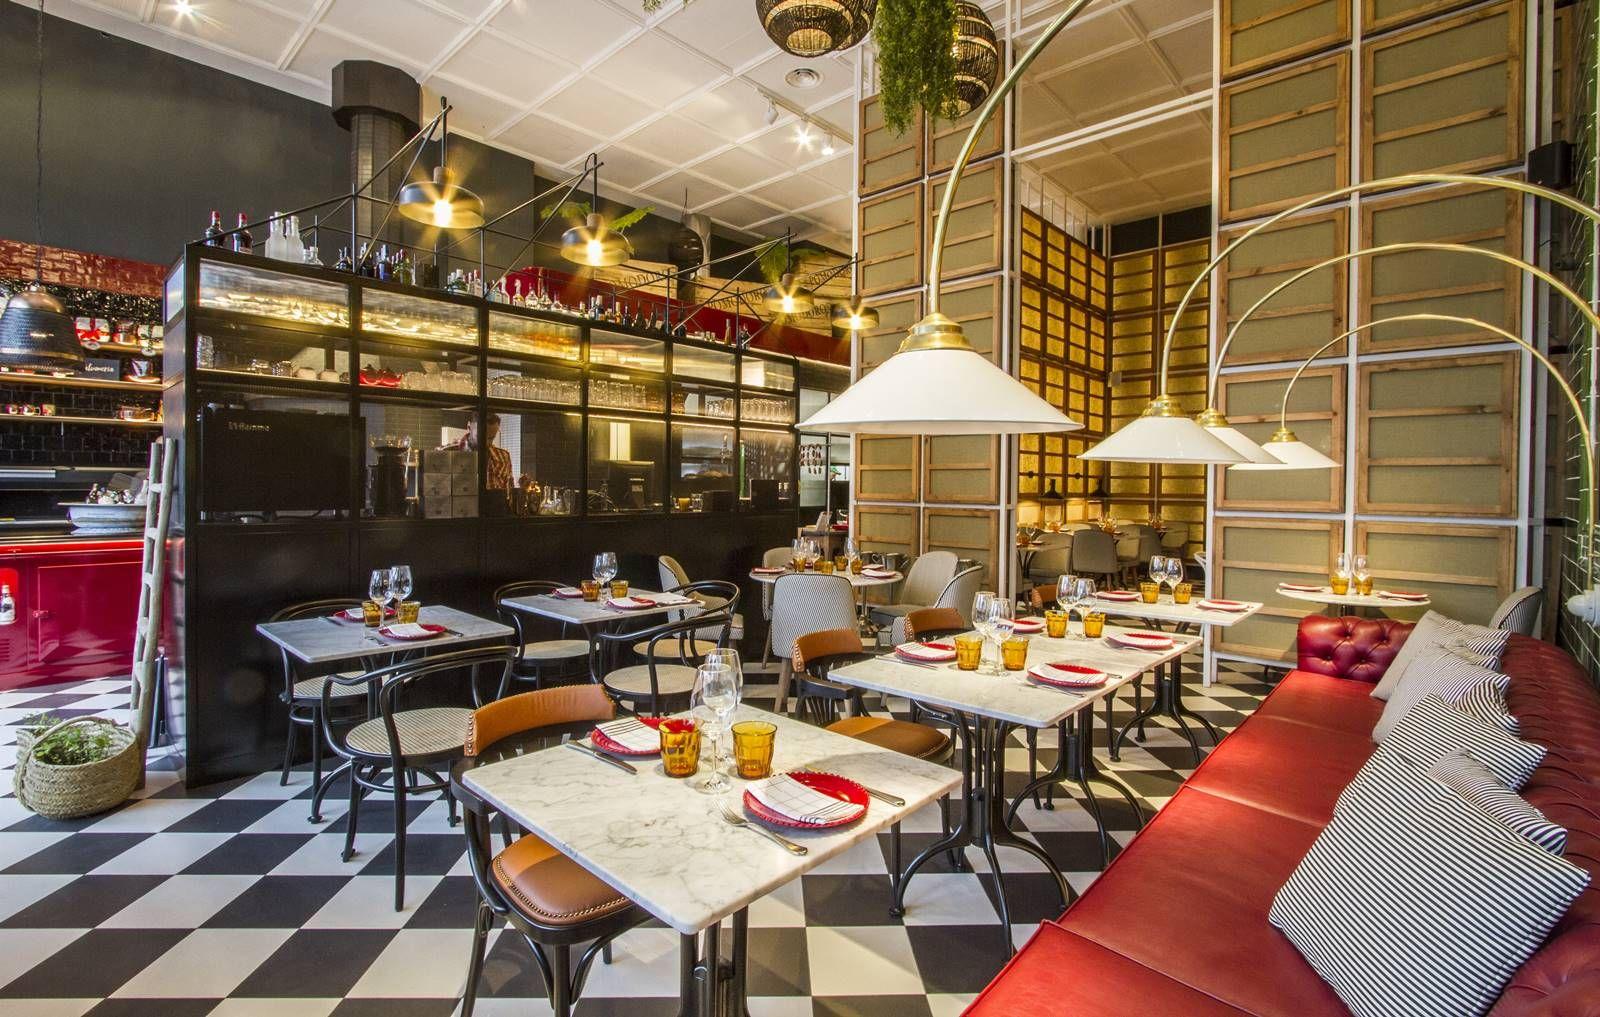 Lazzaroni, un restaurante italiano que nos transporta a otra época